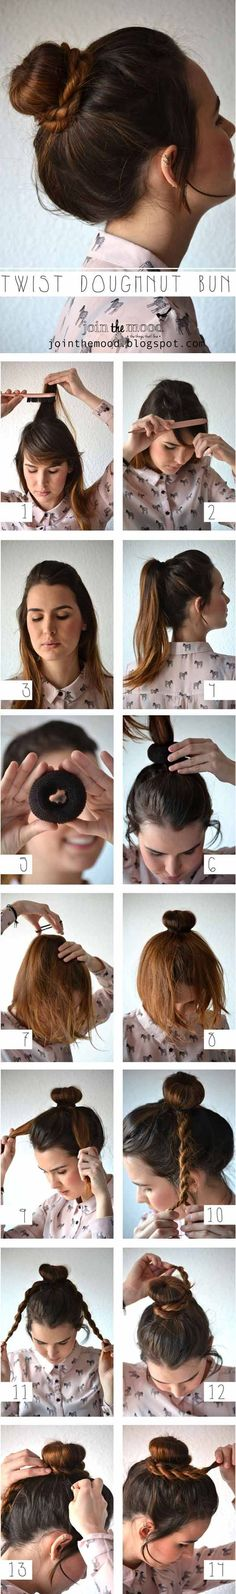 How To Make Twist Doughnut Bun For Your Hair - Hair Tutorials Step By Step Hairstyles, Braided Hairstyles Tutorials, Pretty Hairstyles, Easy Hairstyles, Hair Tutorials, Hairstyle Ideas, Wedding Hairstyles, Updo Hairstyle, Latest Hairstyles